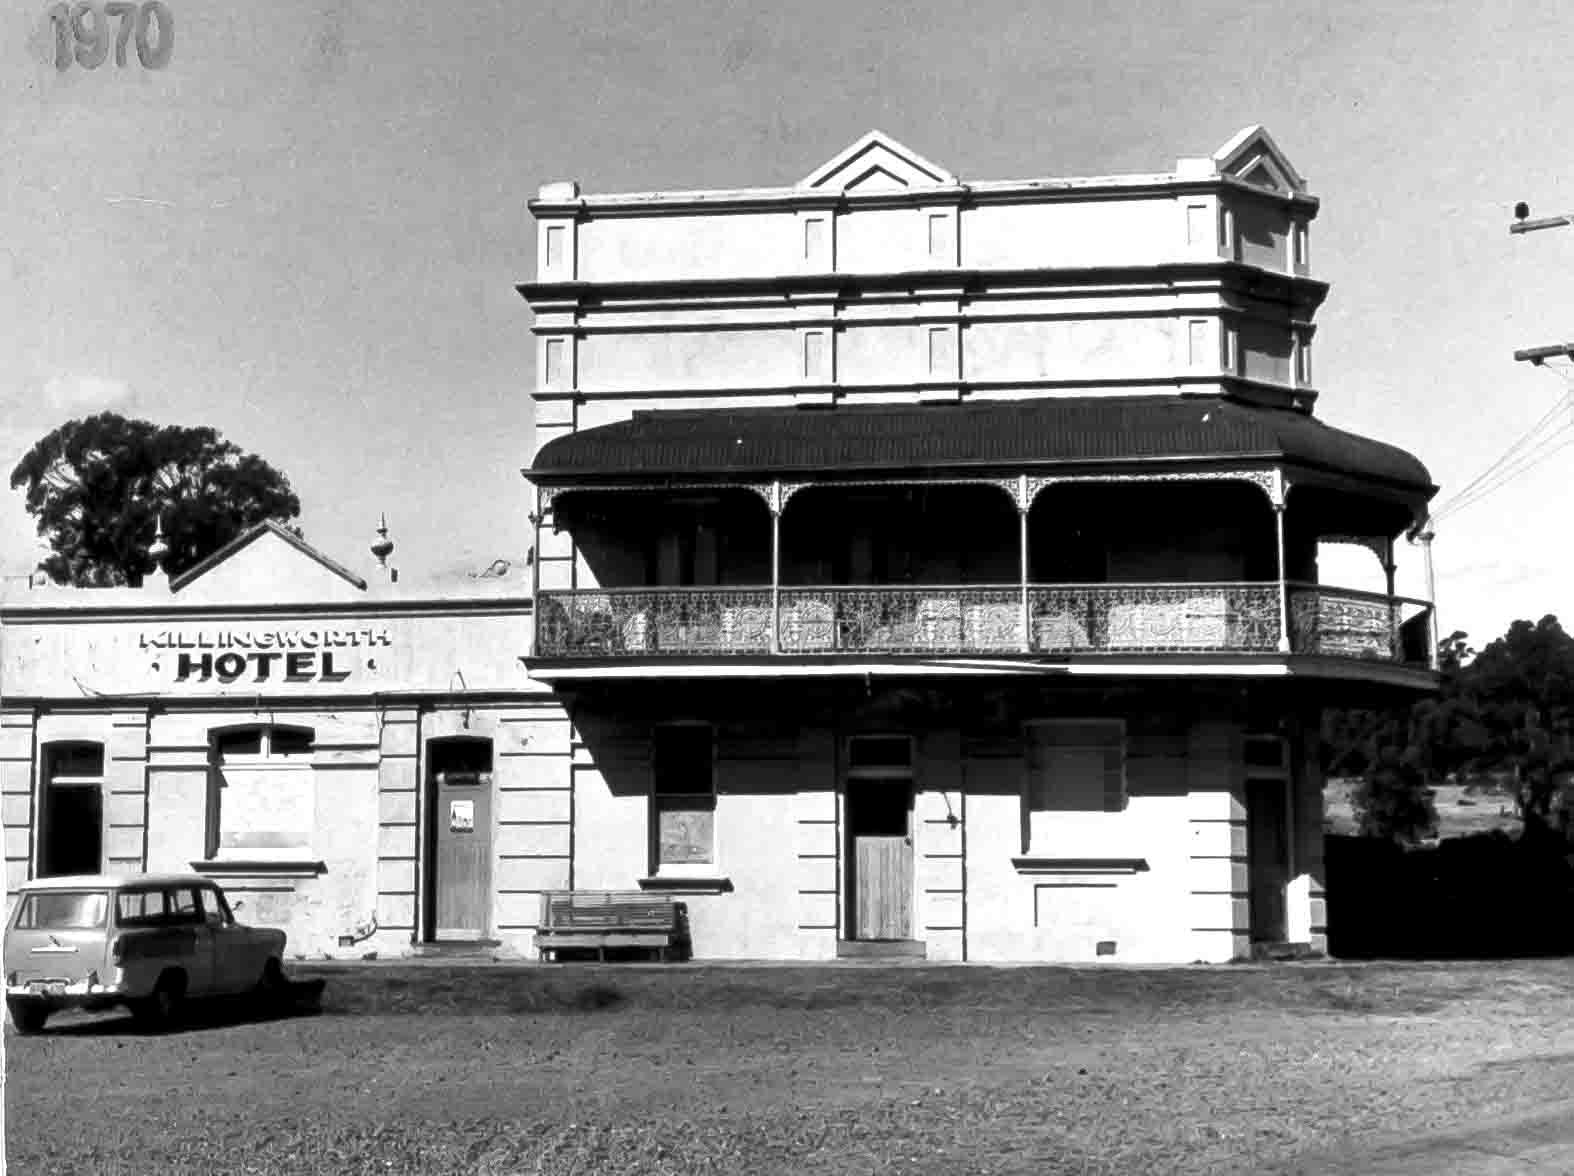 Killingworth Hotel 1970 small